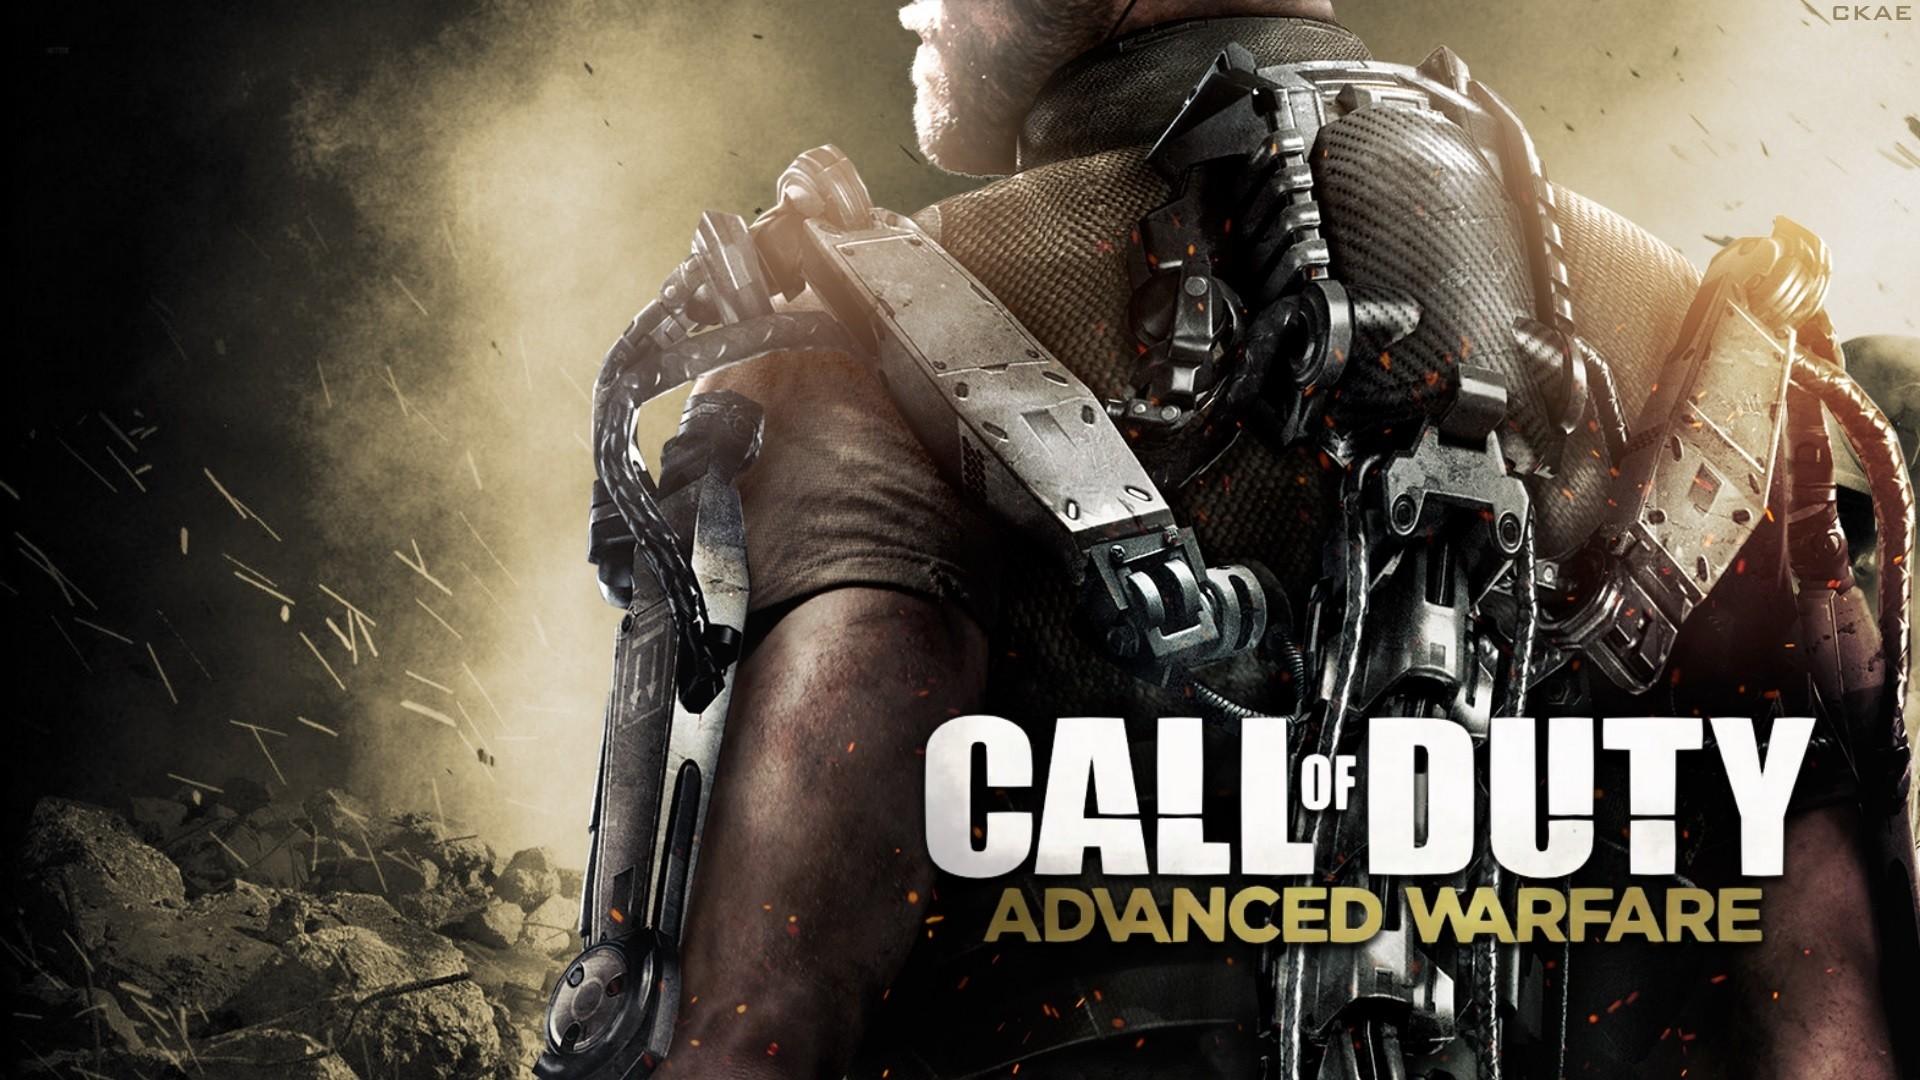 Video Games Call Of Duty Comics Poster Advanced Warfare Screenshot Computer Wallpaper Pc